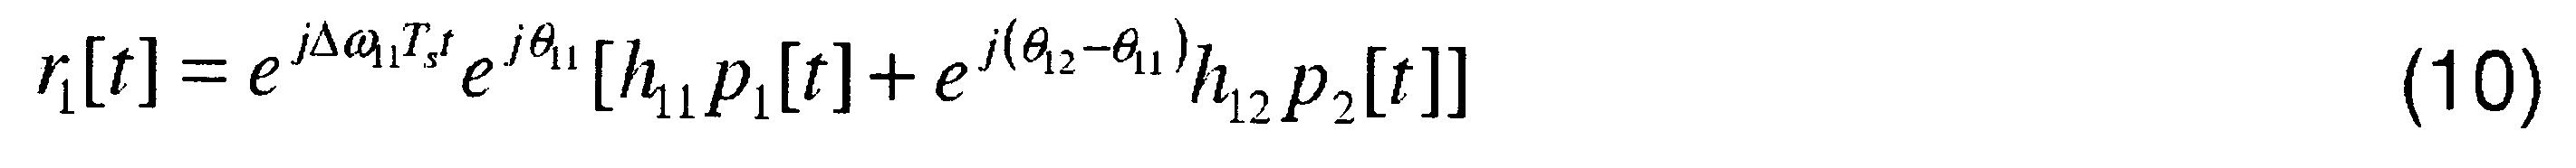 Figure 112015010005017-pat00075